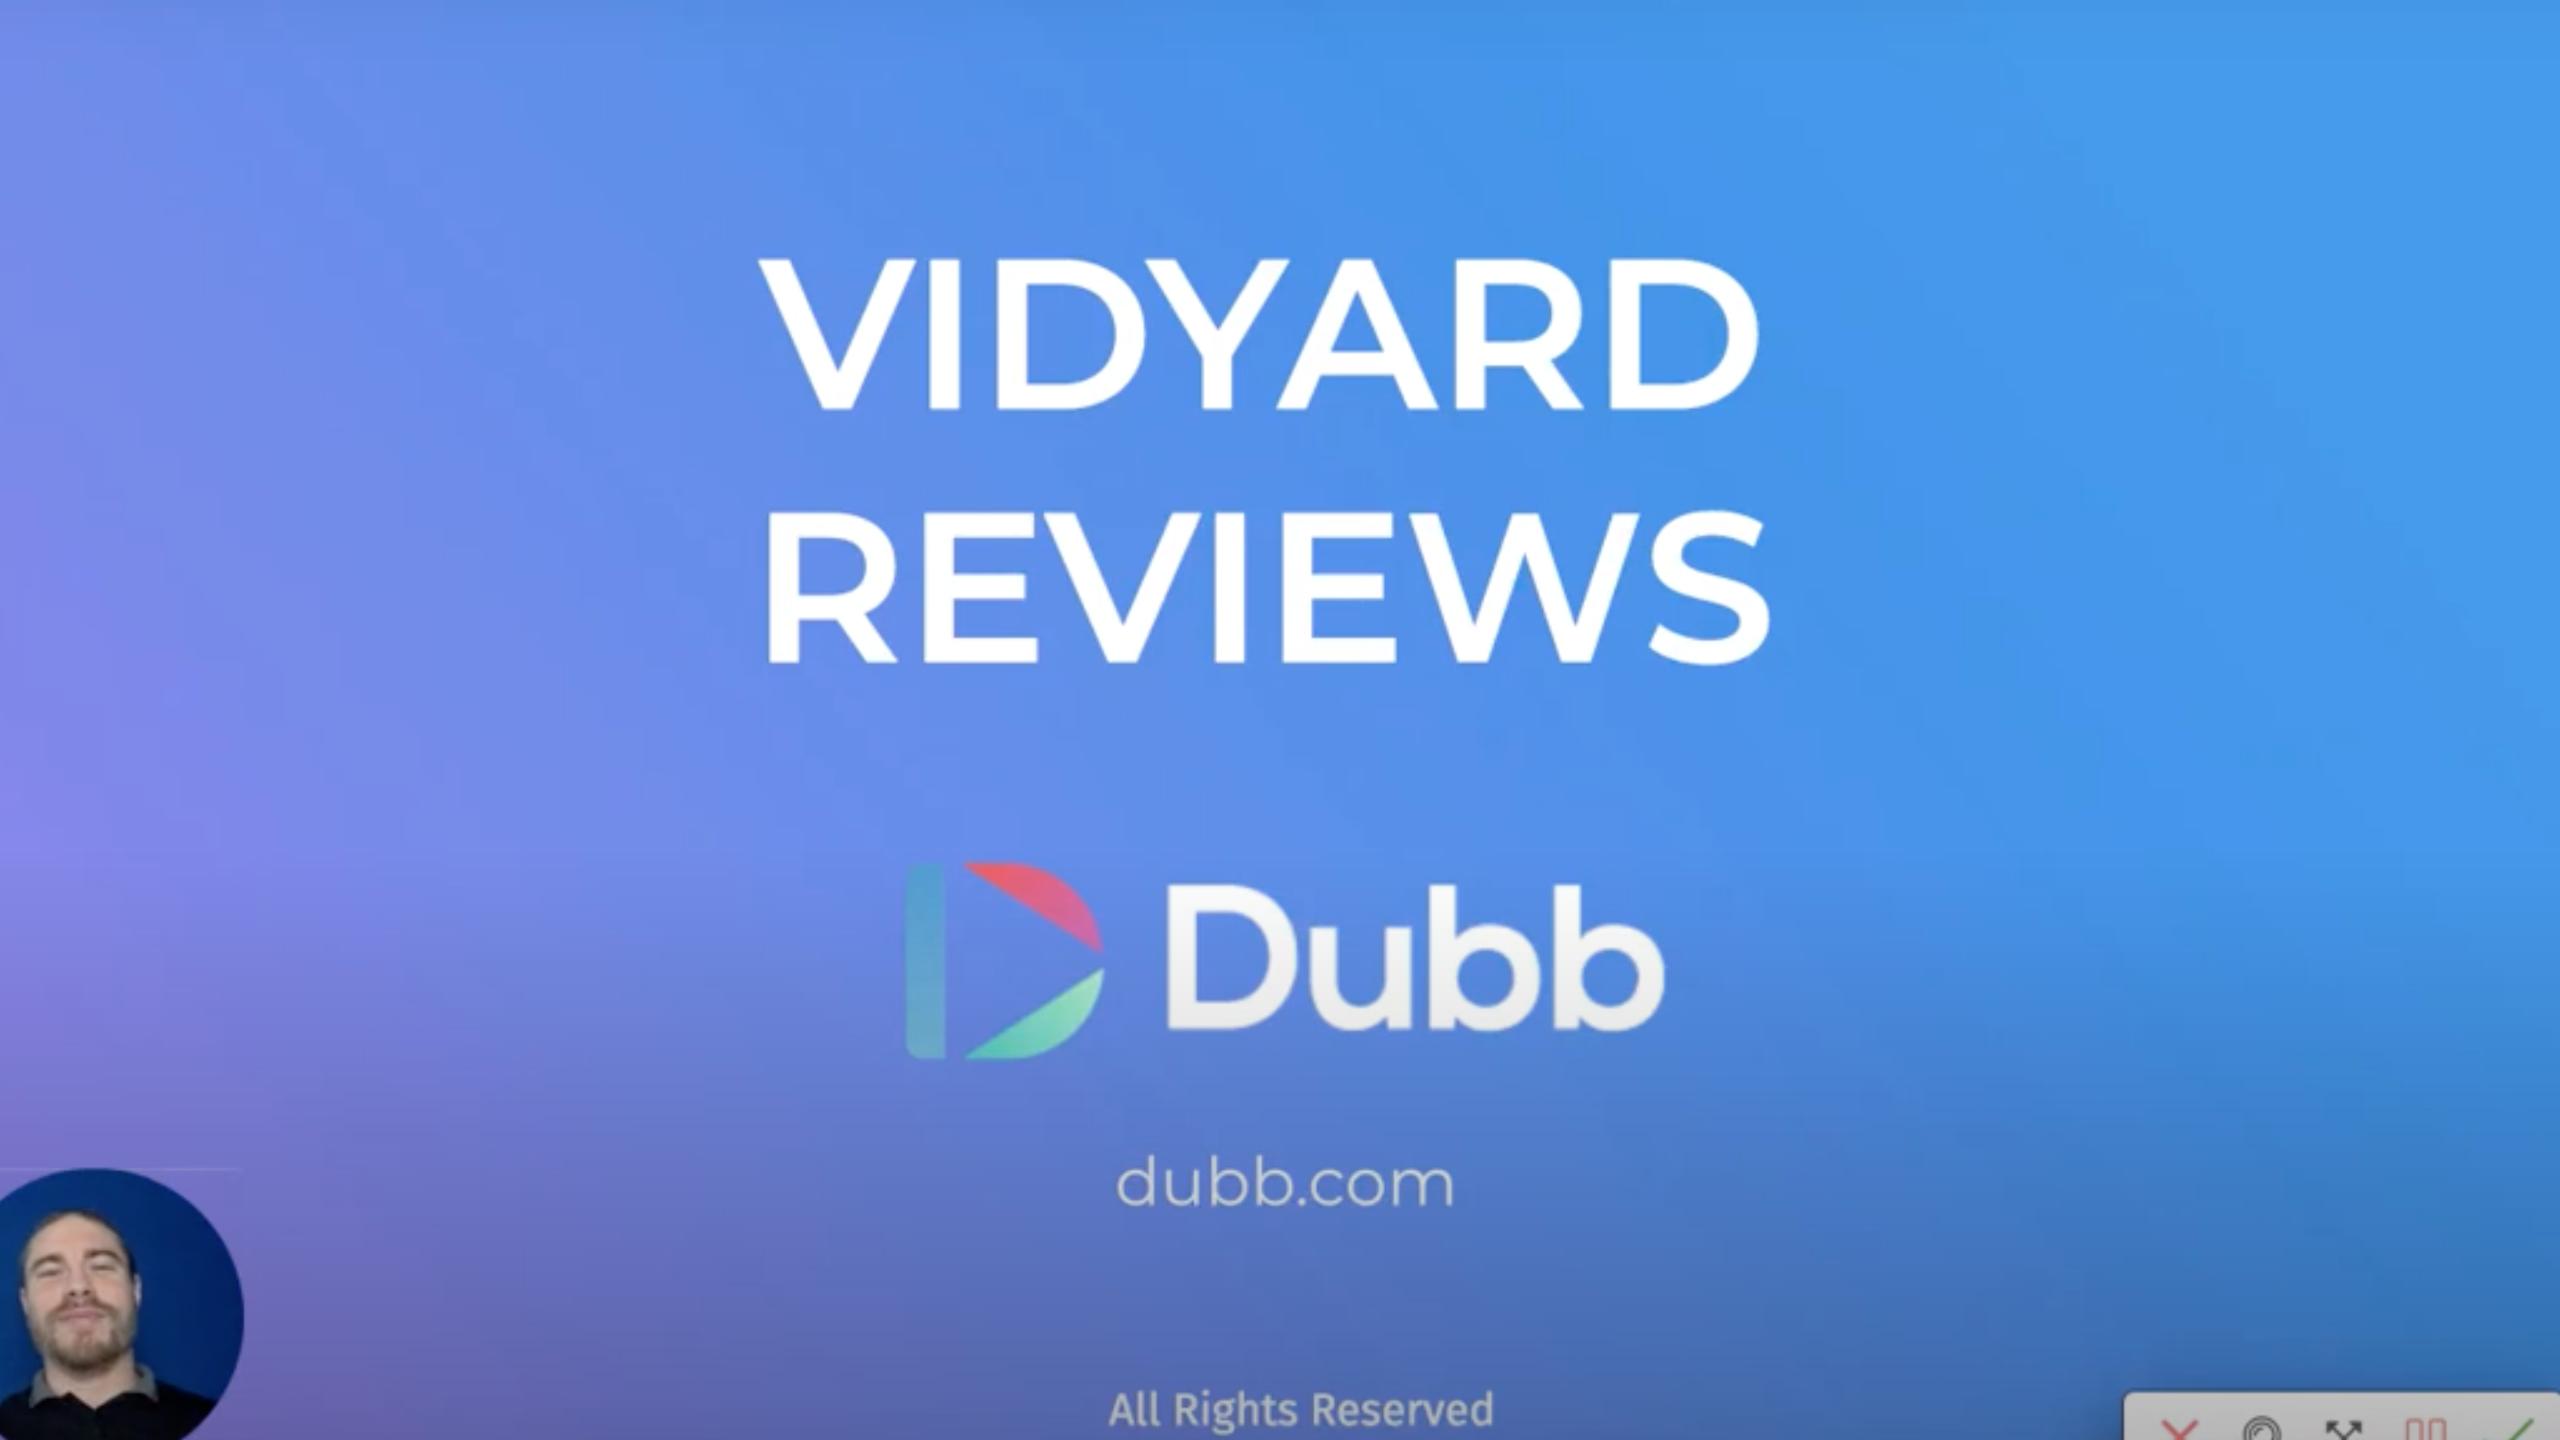 Vidyard Reviews Compared to Dubb Reviews